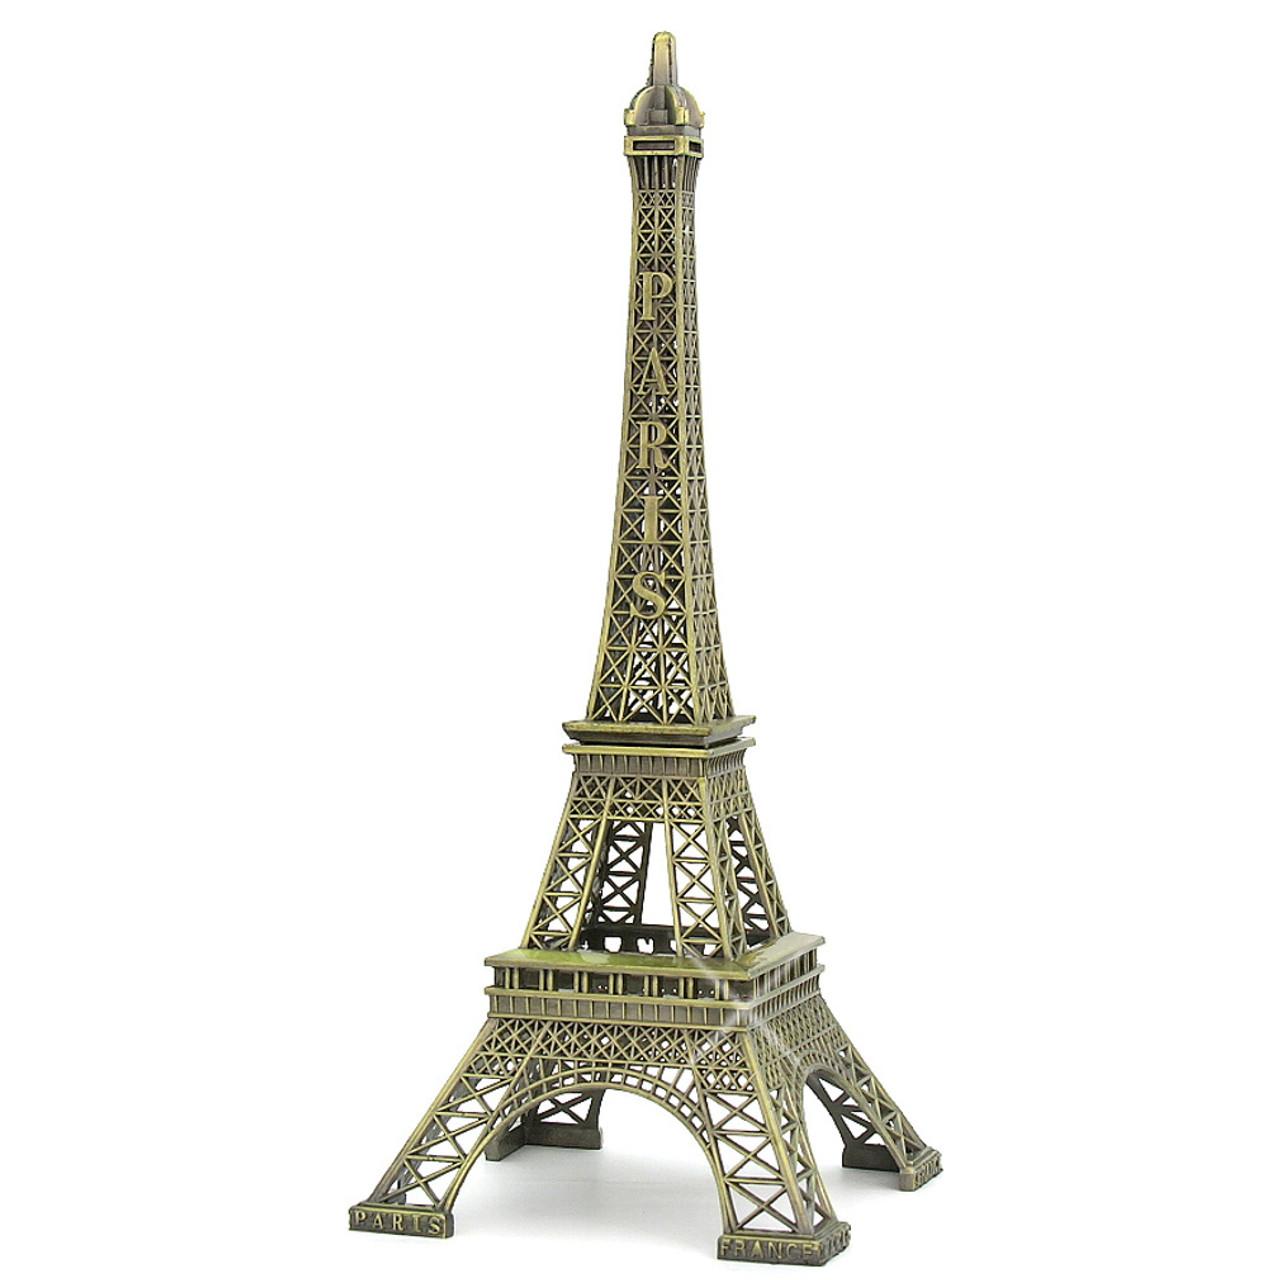 Awesome 15 Inch Eiffel Tower Statue Home Decor Paris Souvenir